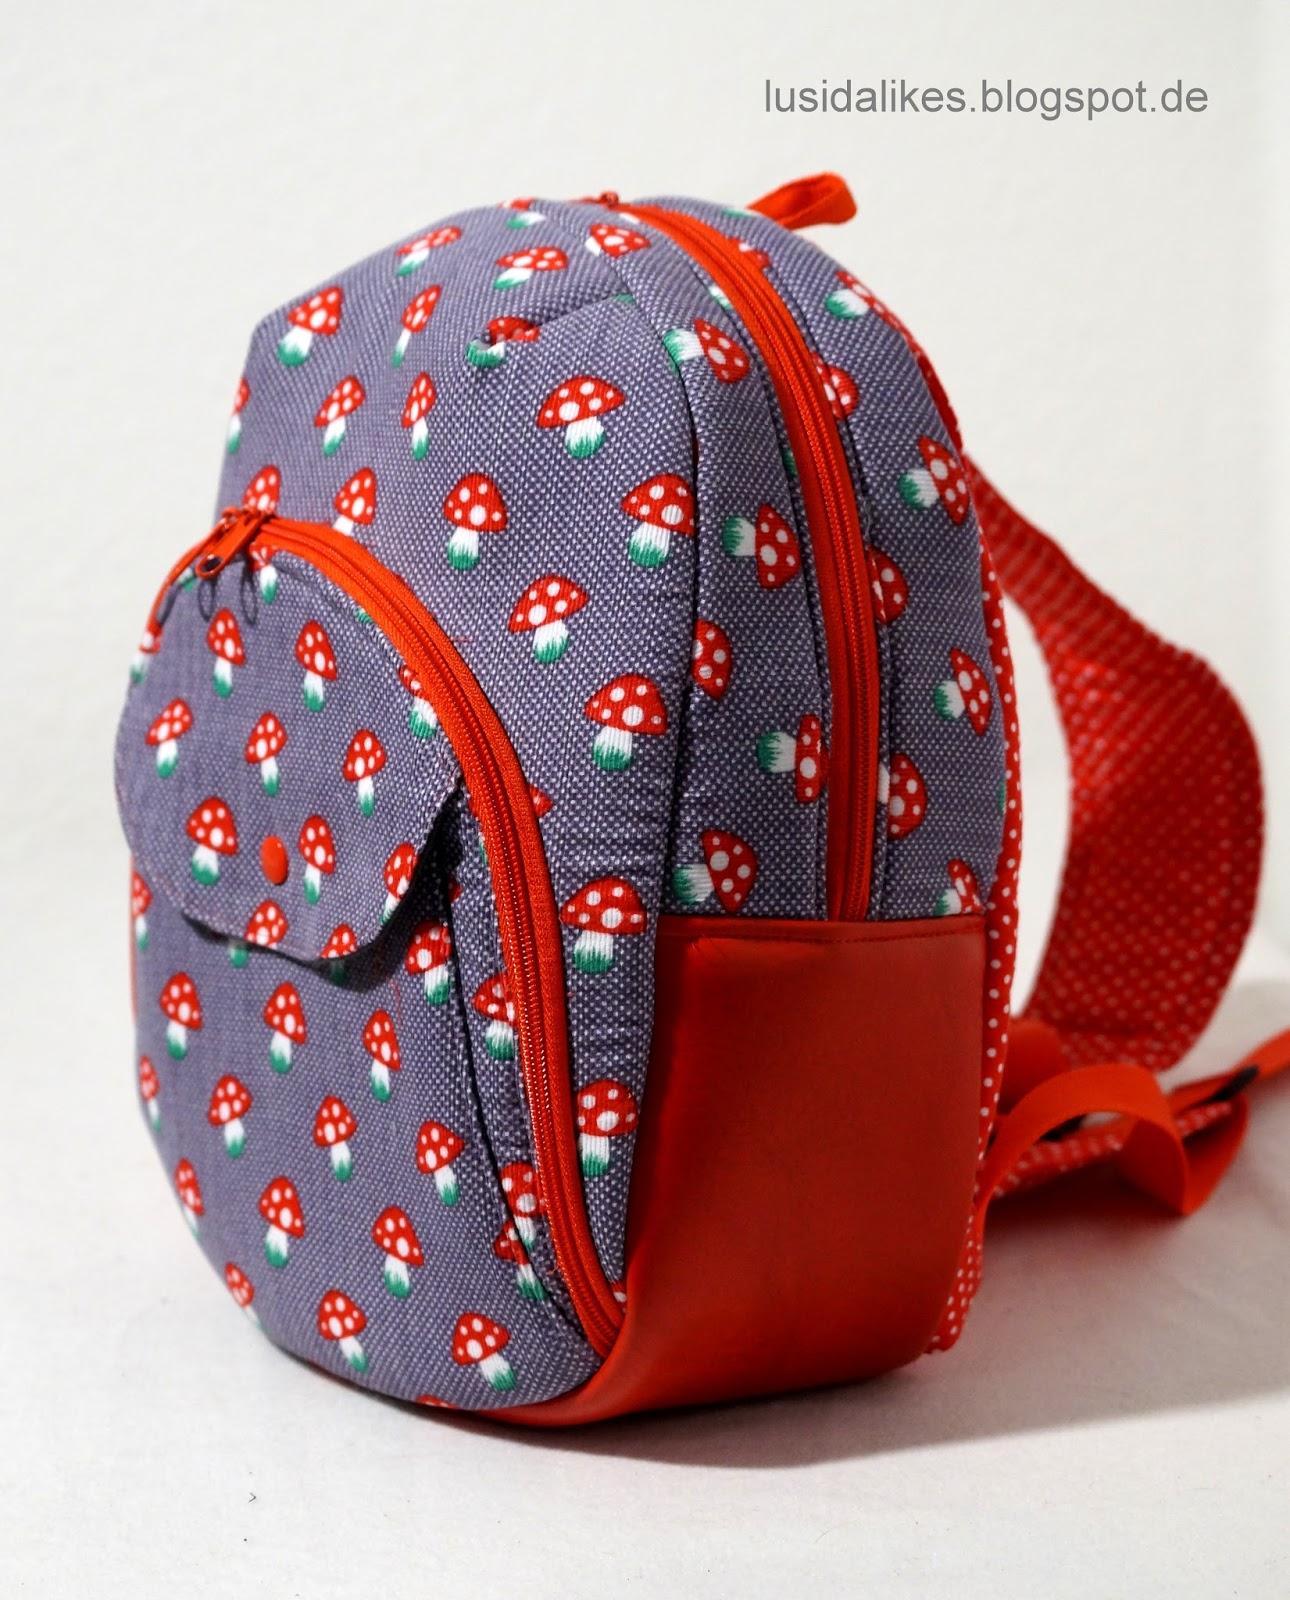 Lusida likes: Kleiner Cumberland Backpack